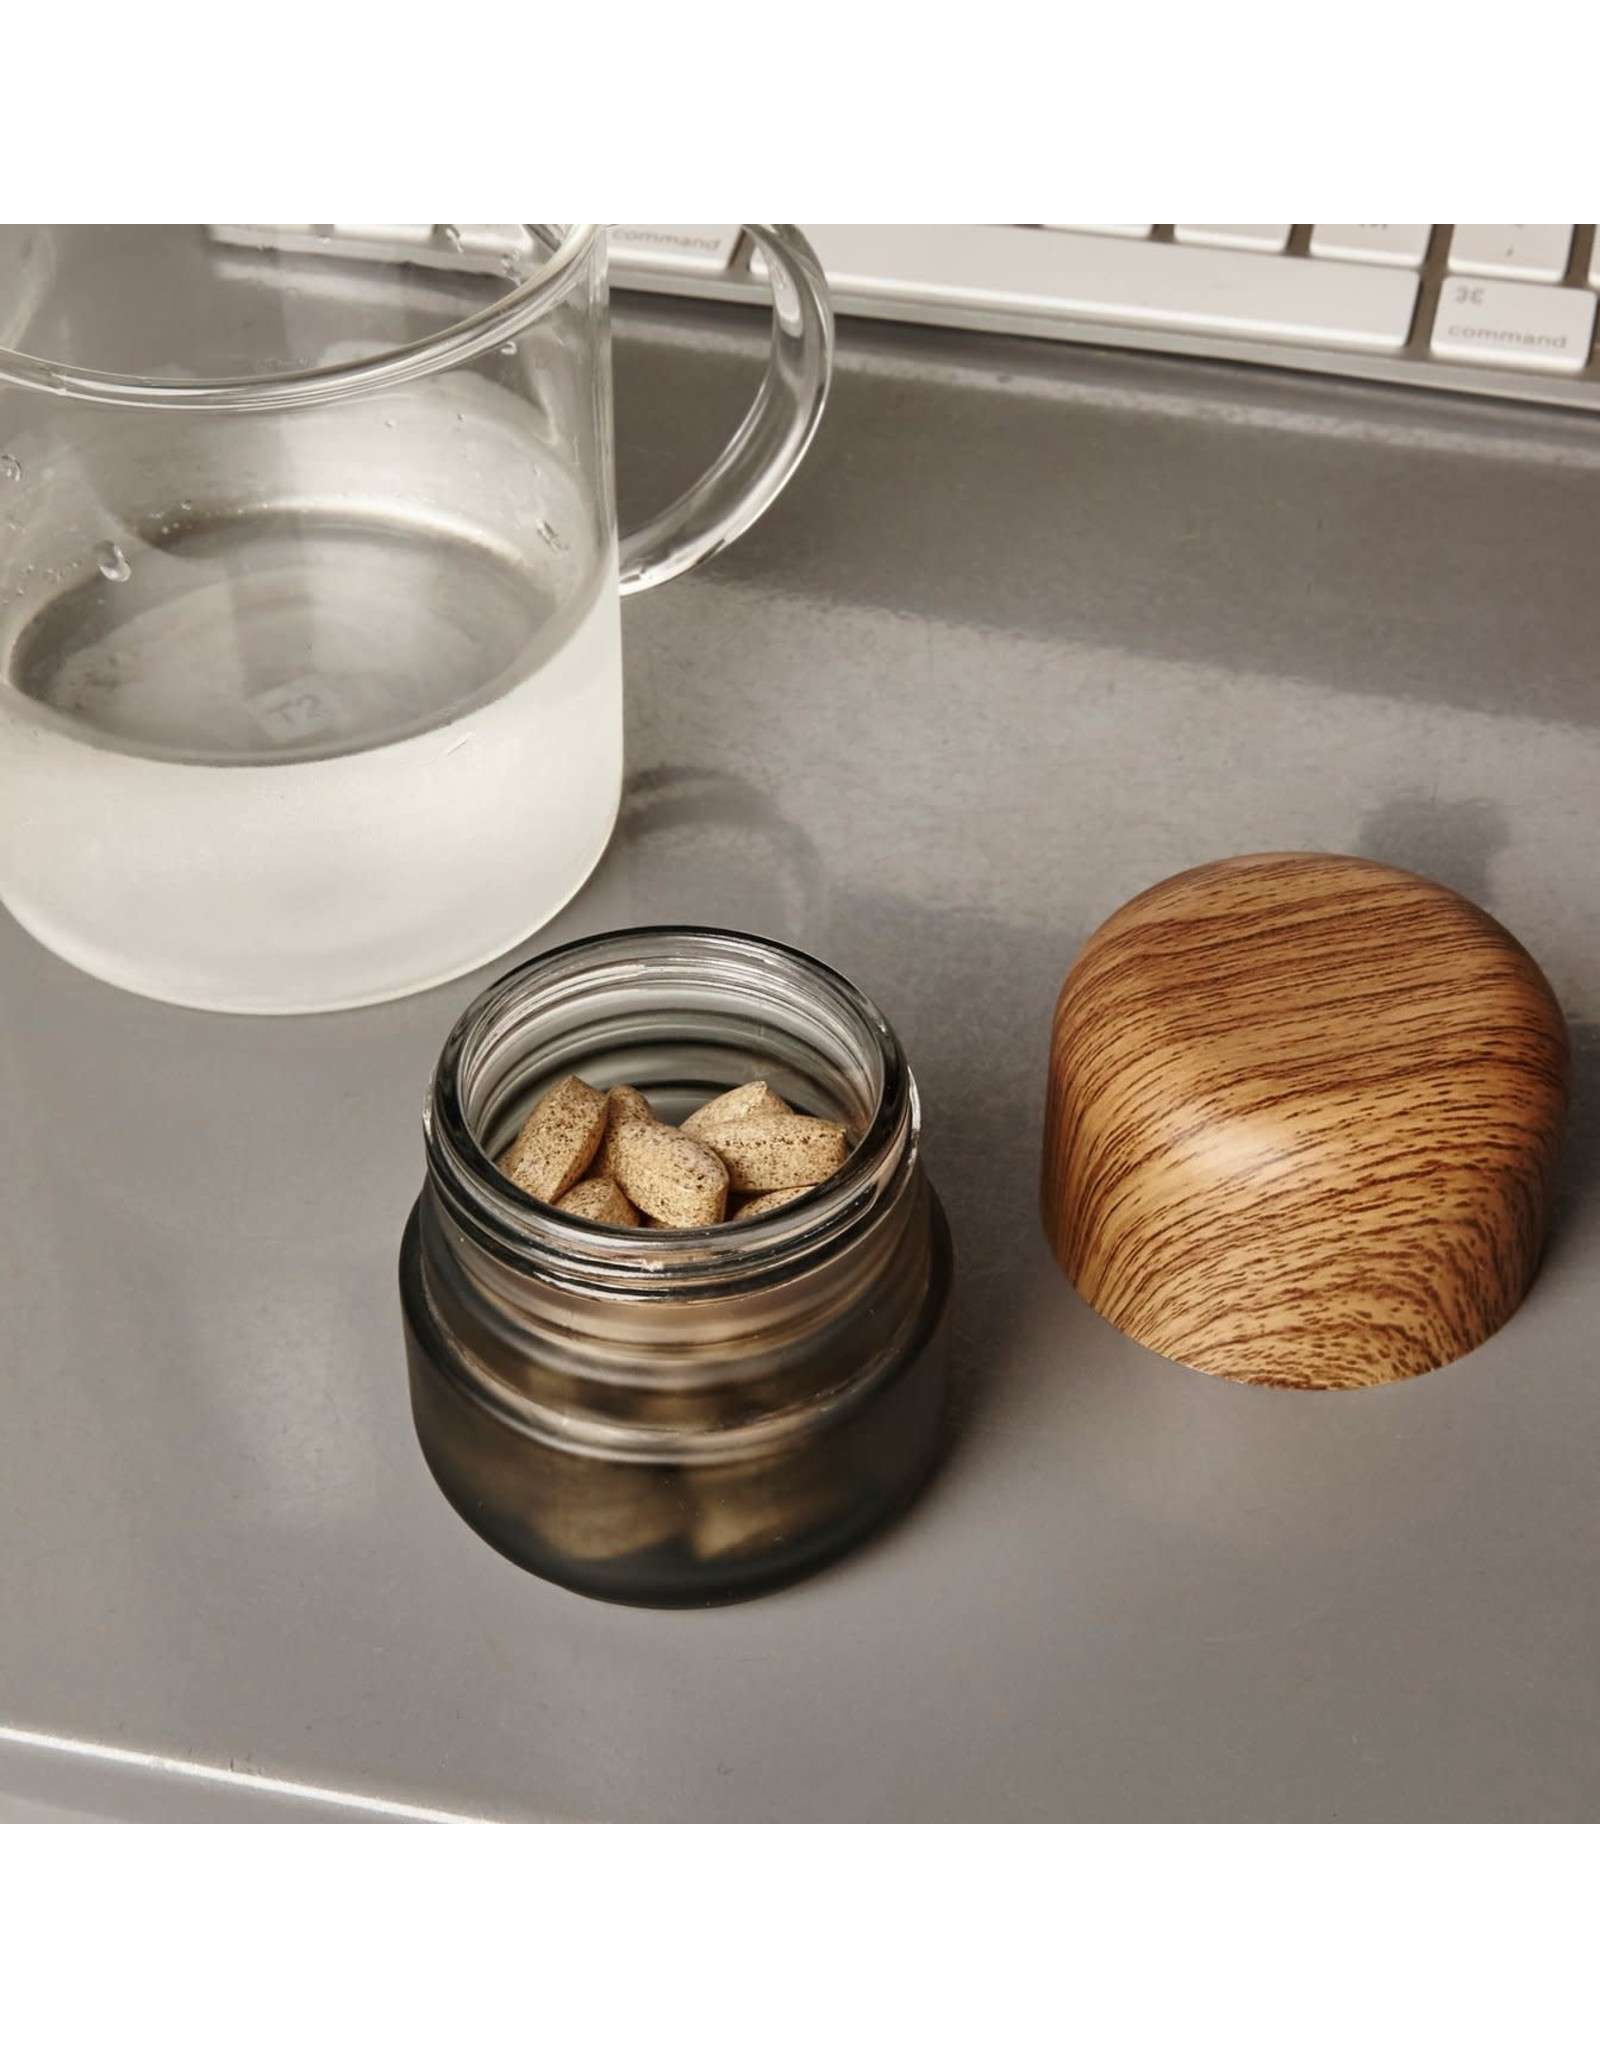 KIK Small Childproof Stash Jar in Black